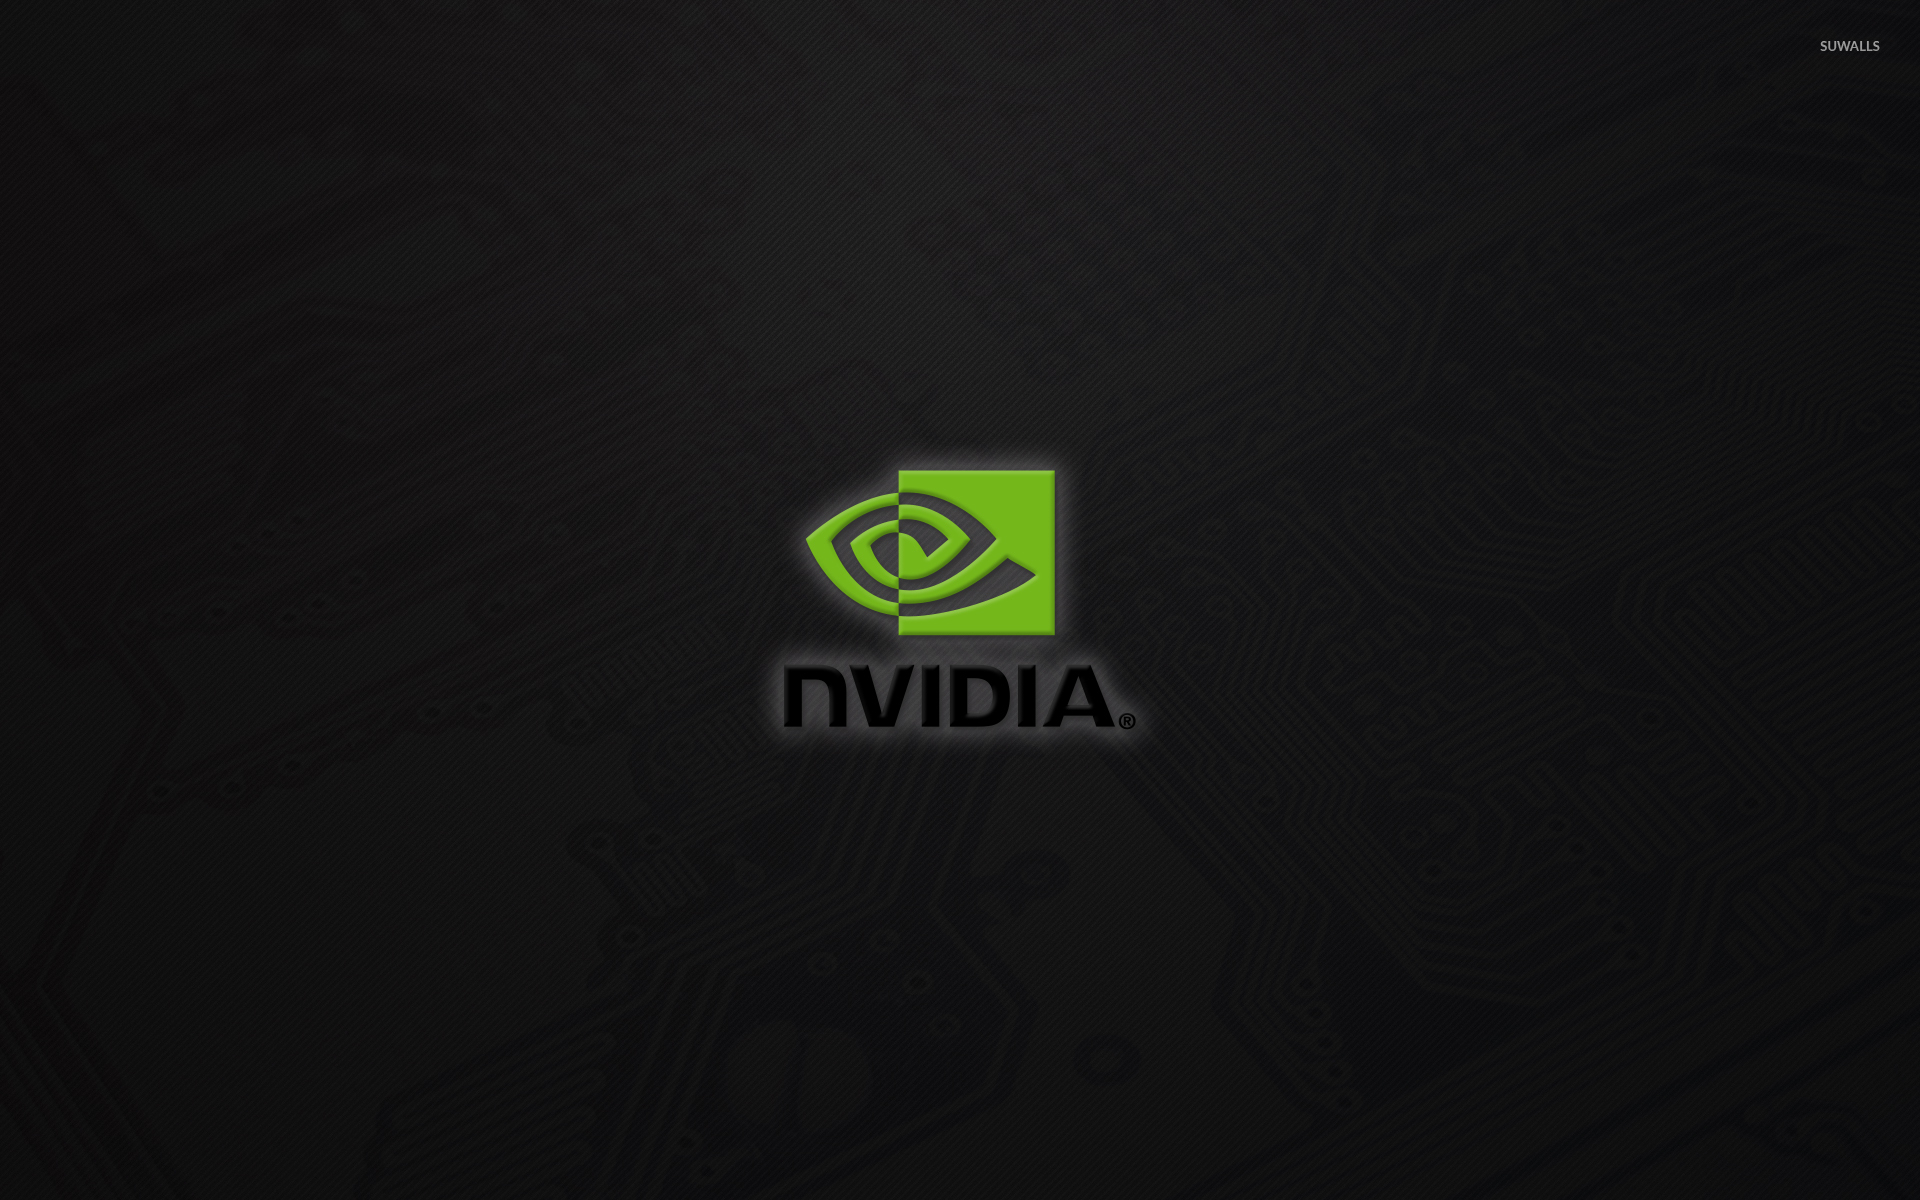 nvidia wallpaper ultra - photo #24